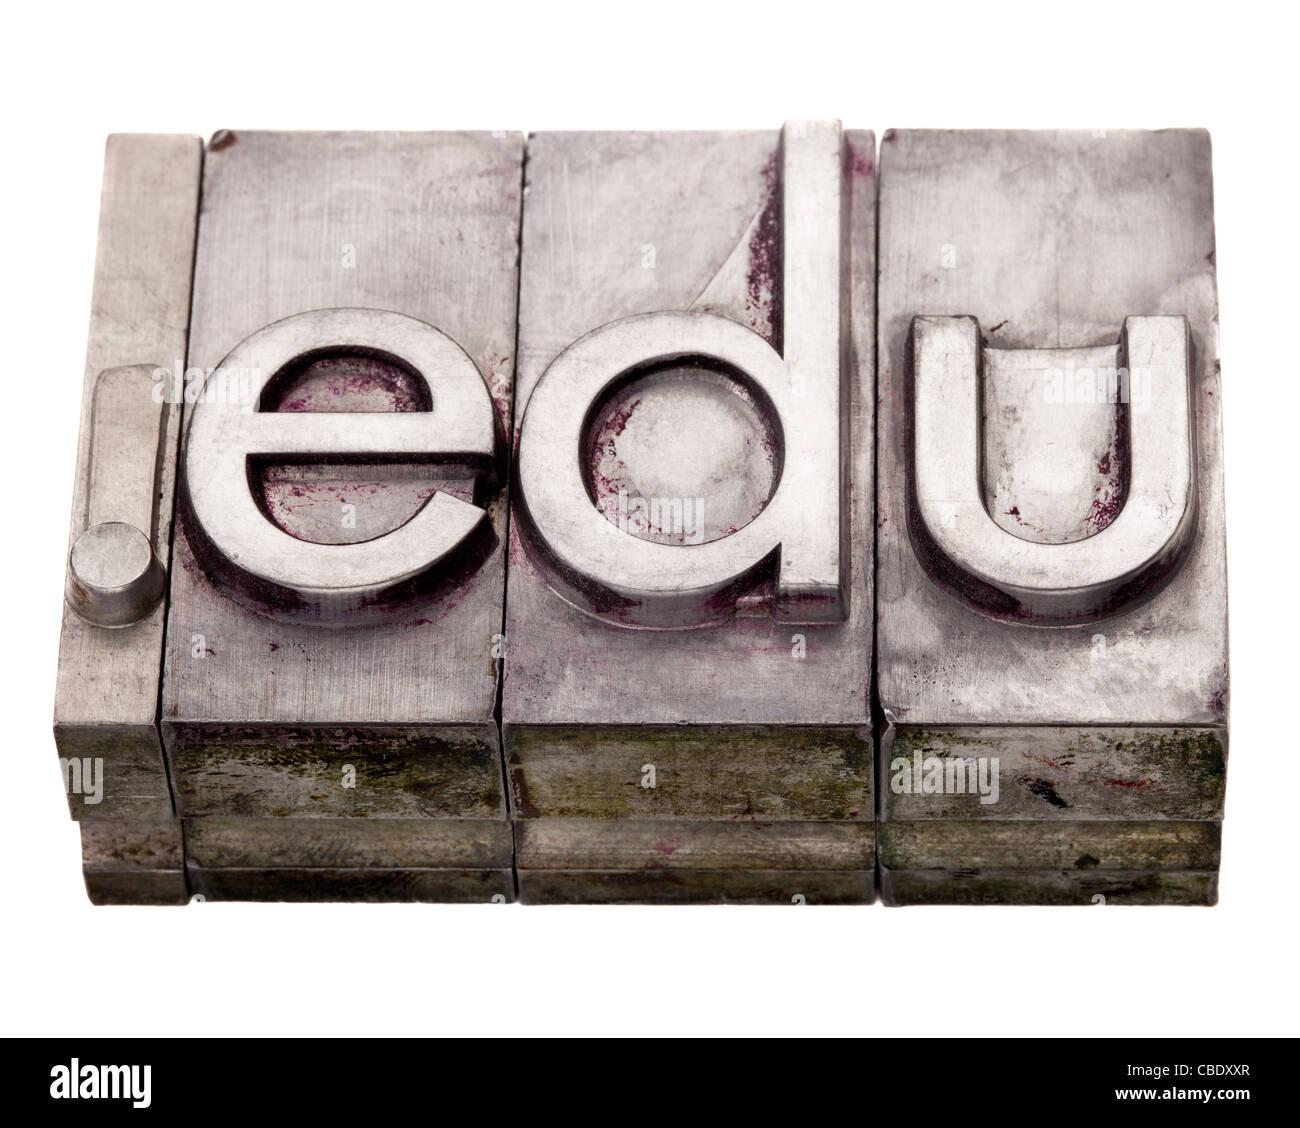 dot com internet educational domain extension in vintage grunge metal letterpress printing blocks - Stock Image